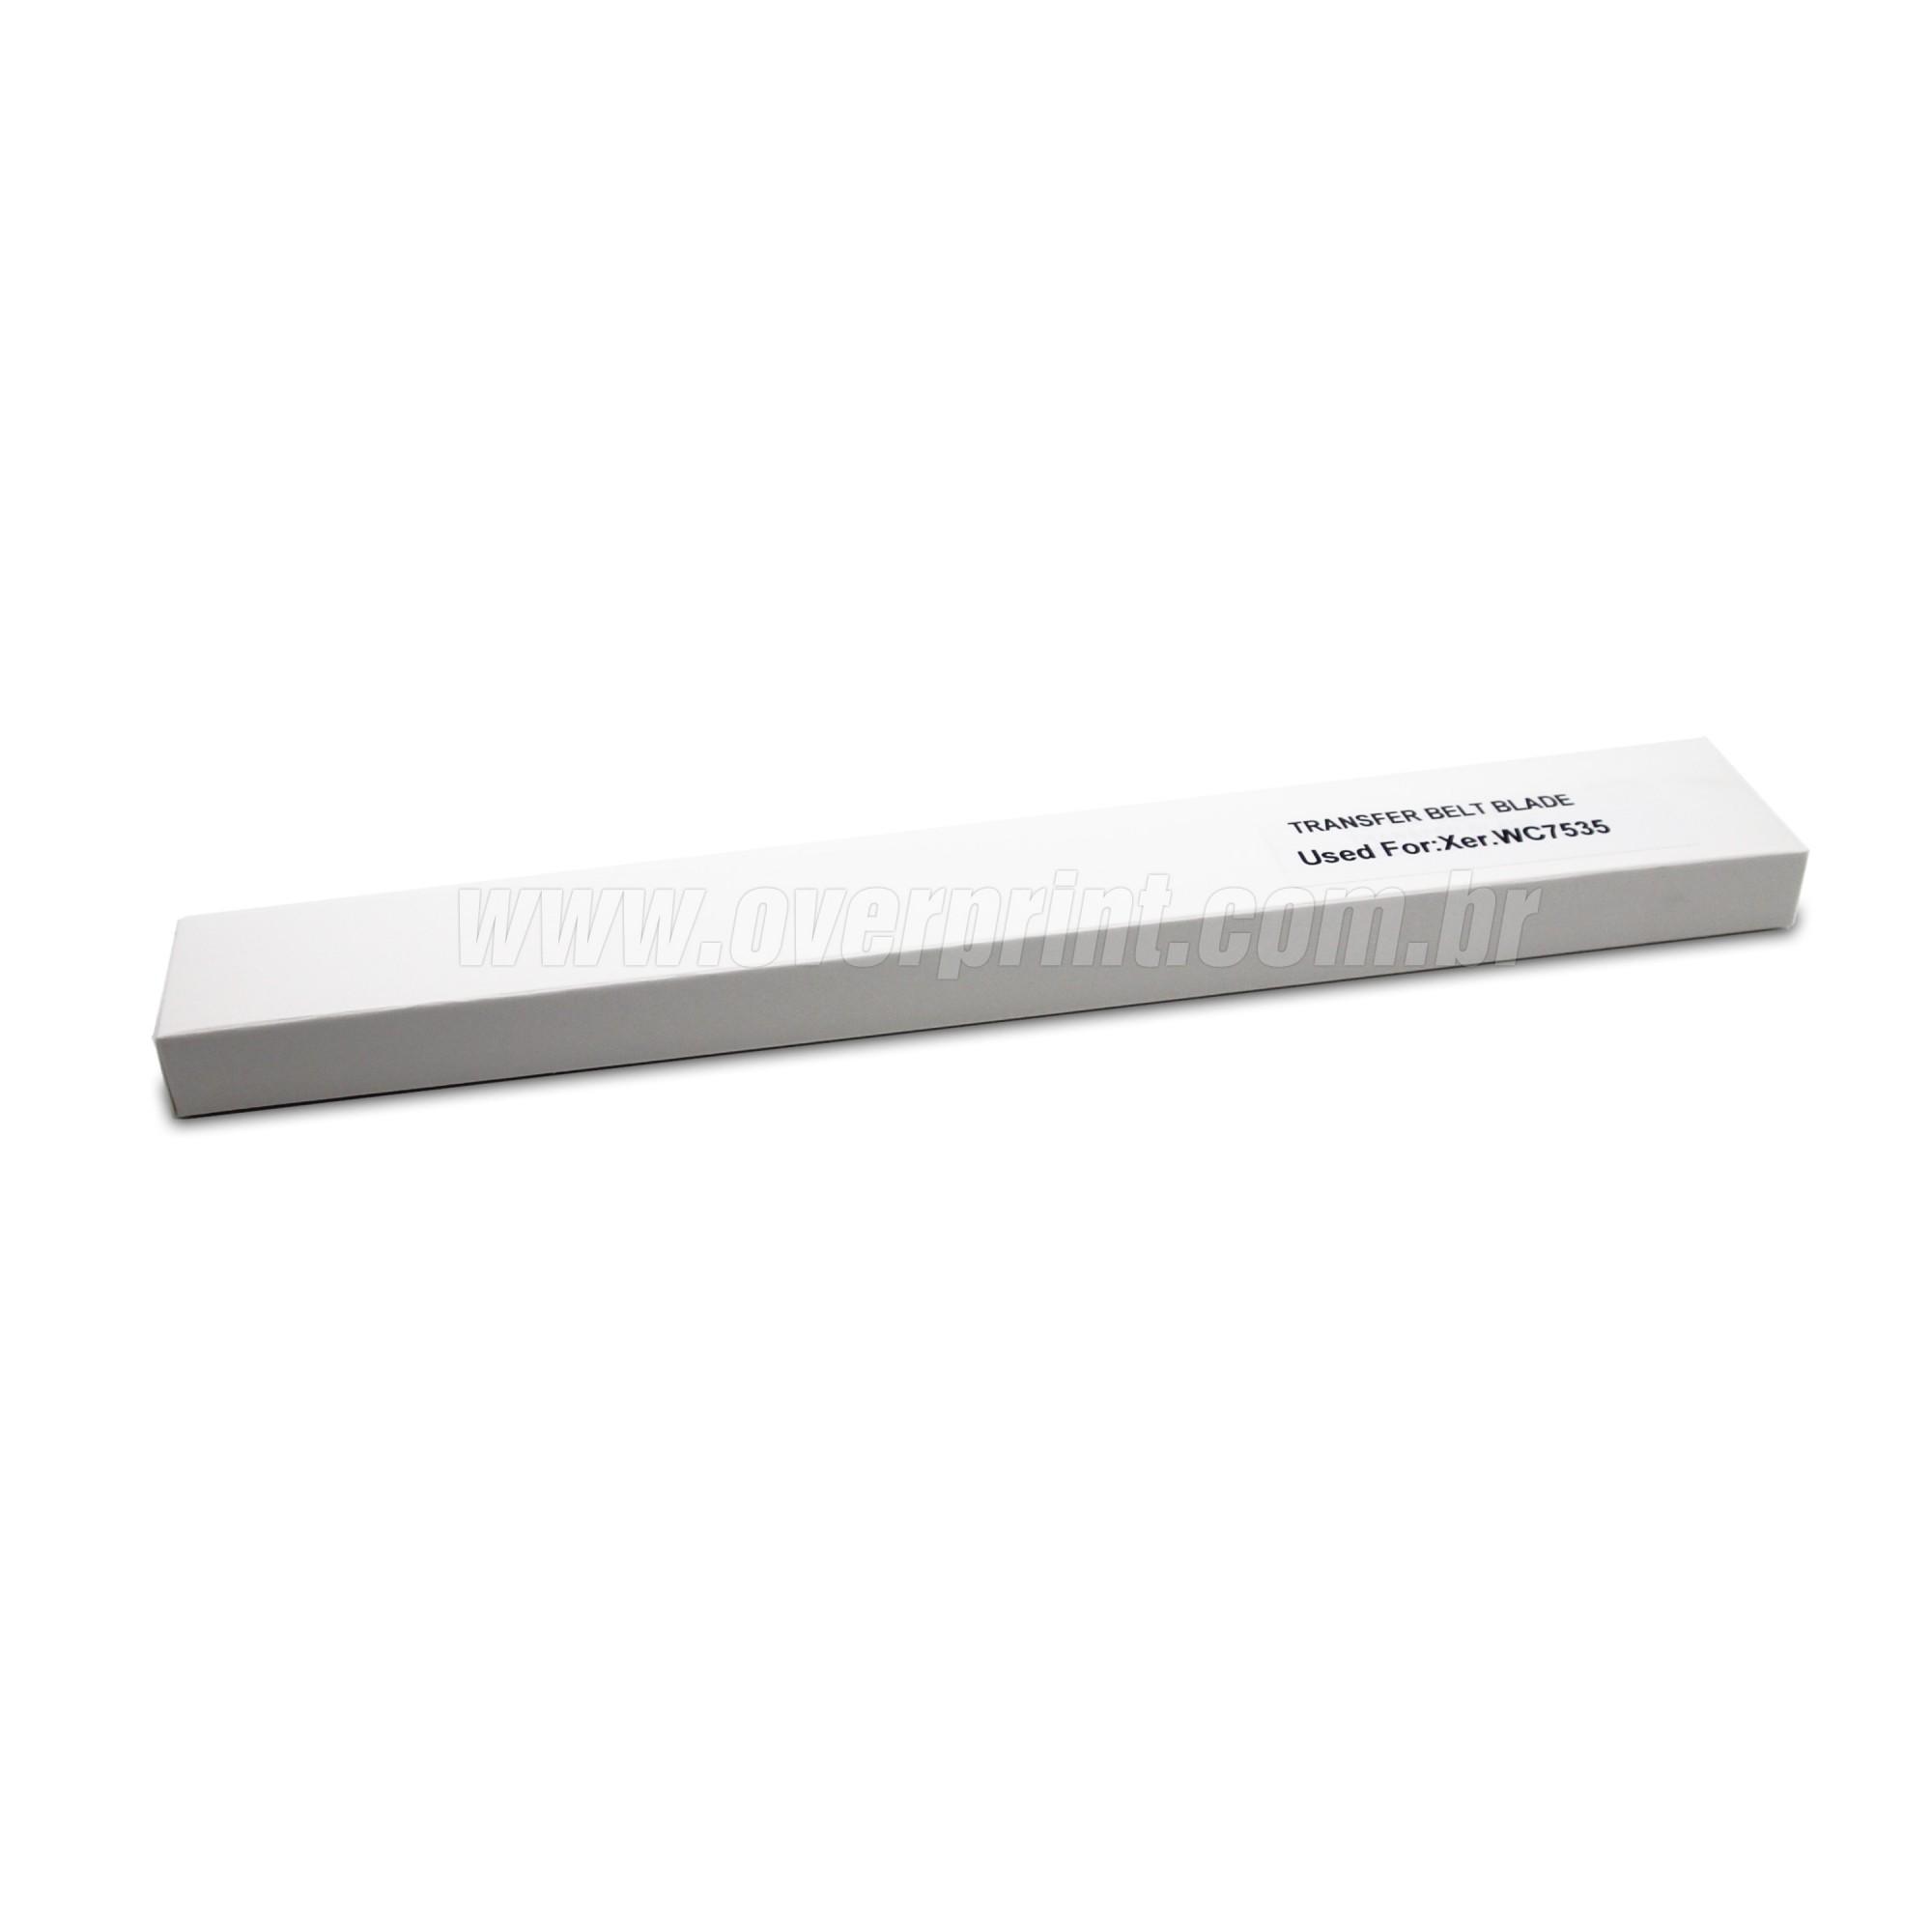 Lâmina de Limpeza da Belt Xerox Phaser 7800 - Overprint